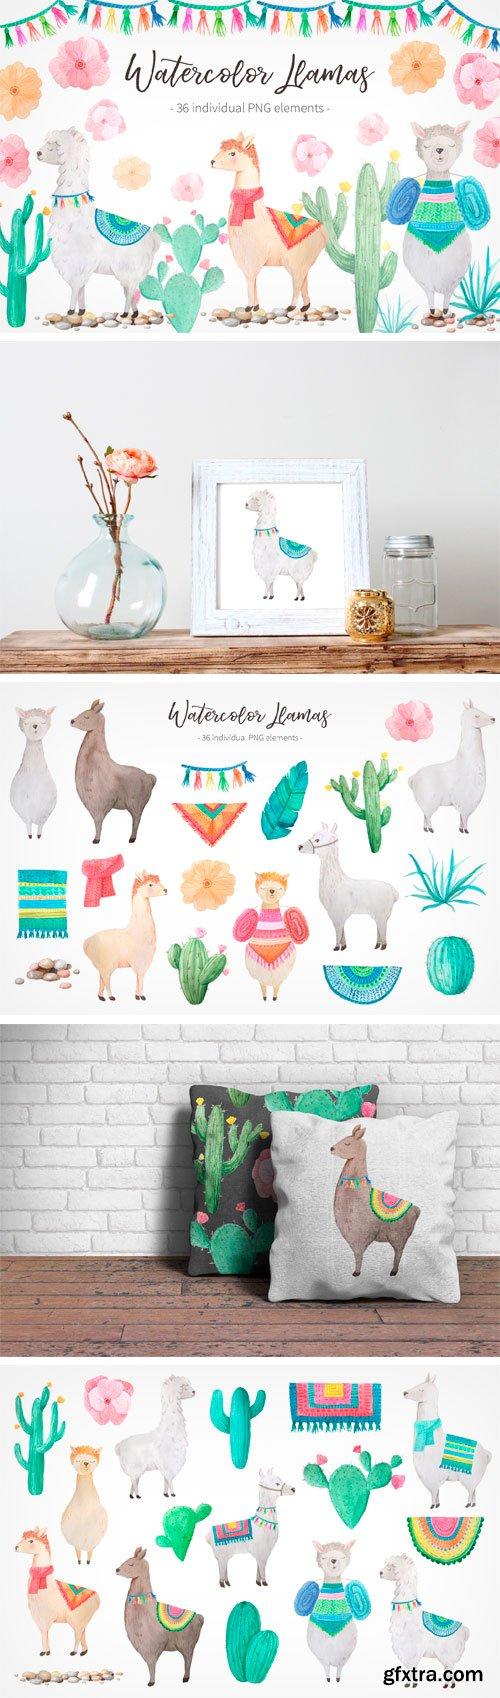 Designbundles - Watercolor Llamas 46881